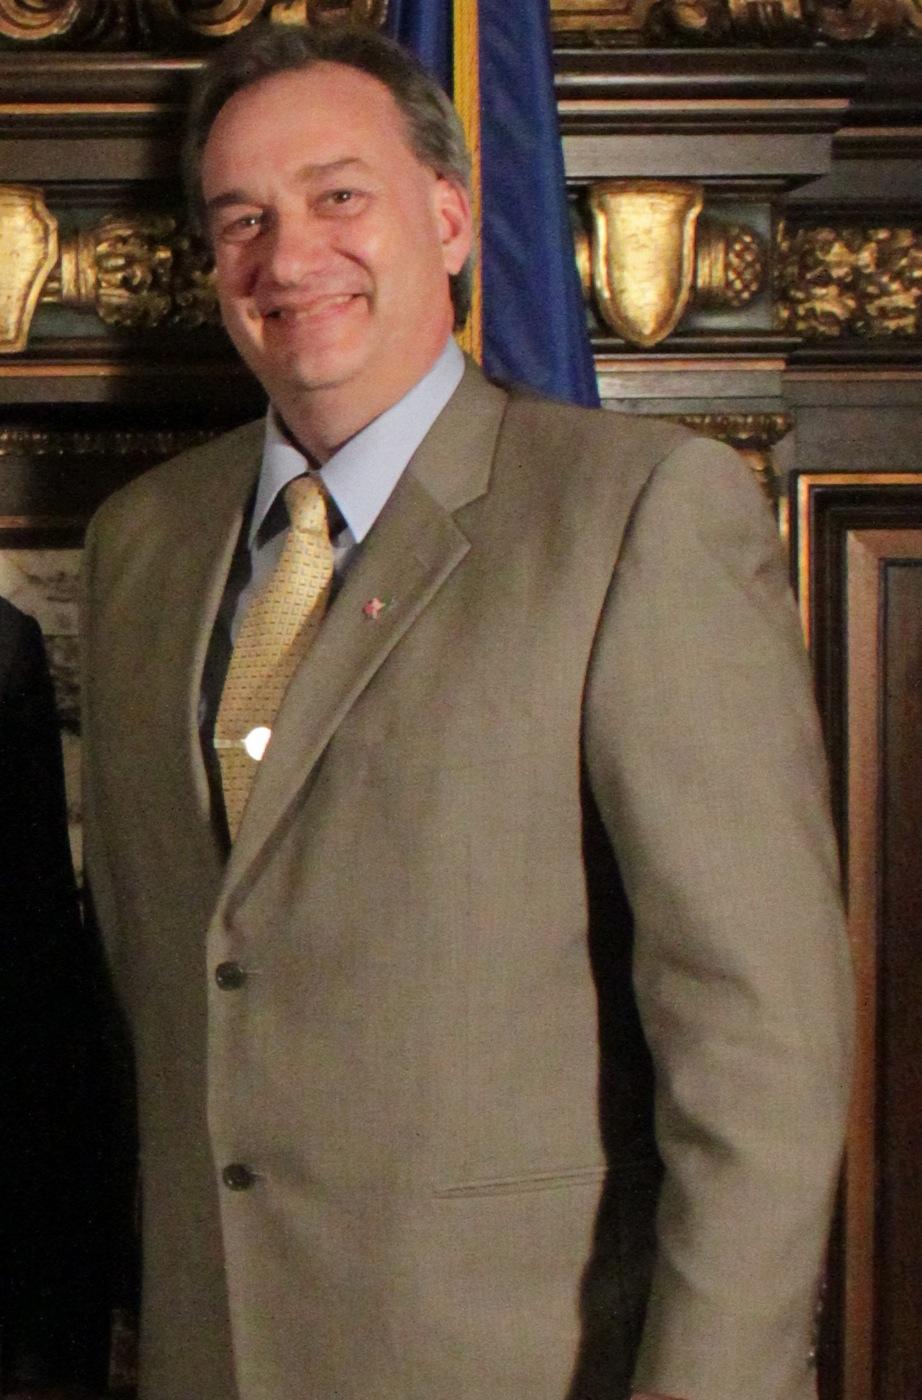 South Eastern University >> Rick Hansen (politician) - Wikipedia